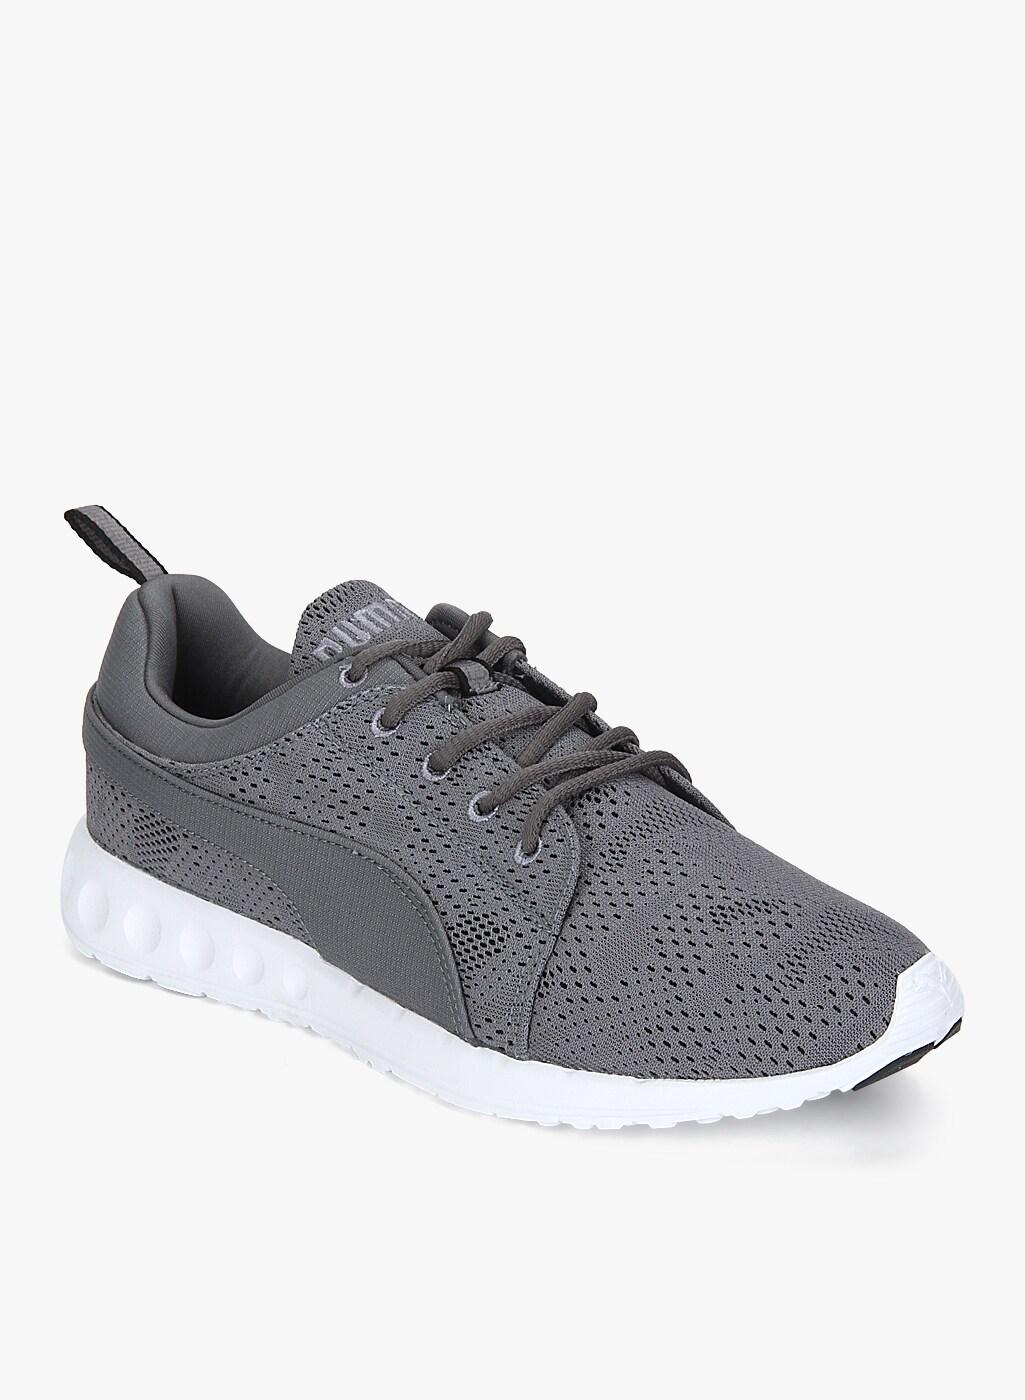 Puma Shoes Wristbands Track Pants - Buy Puma Shoes Wristbands Track Pants  online in India 38404c5d0